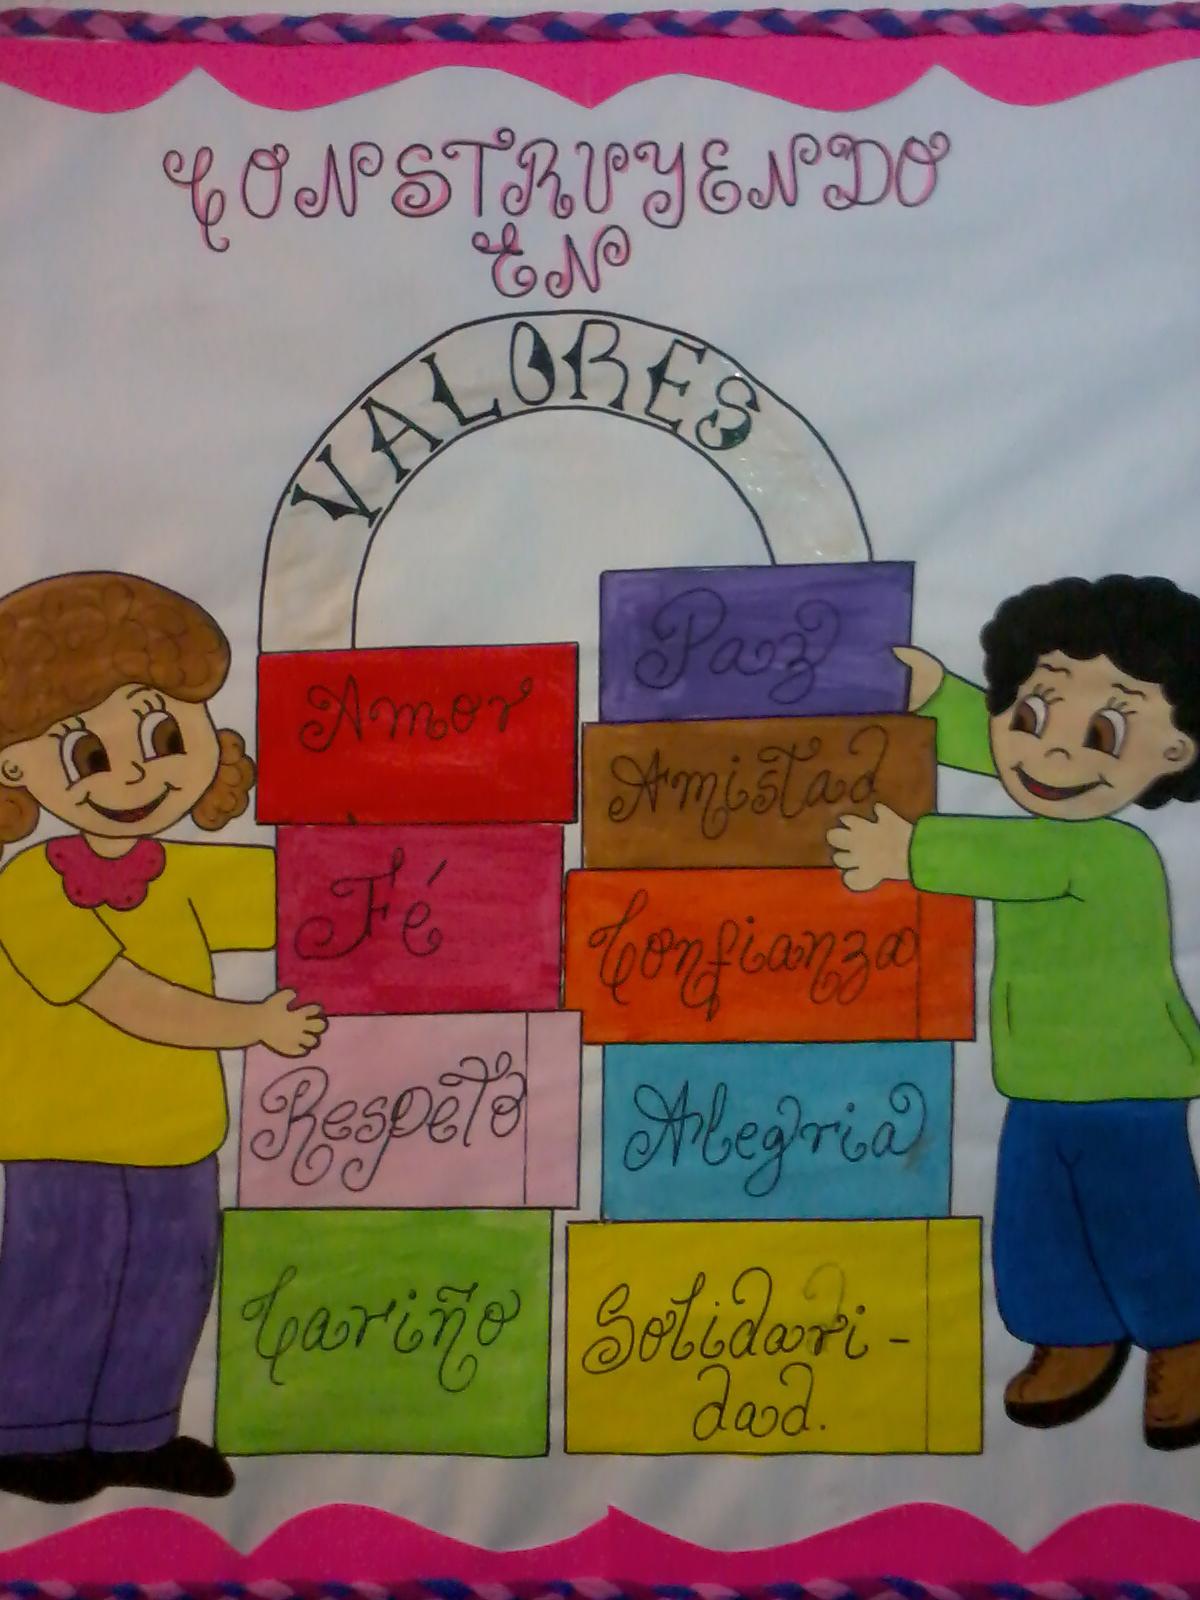 Cartelera de los valores imagui for Modelos de carteleras escolares